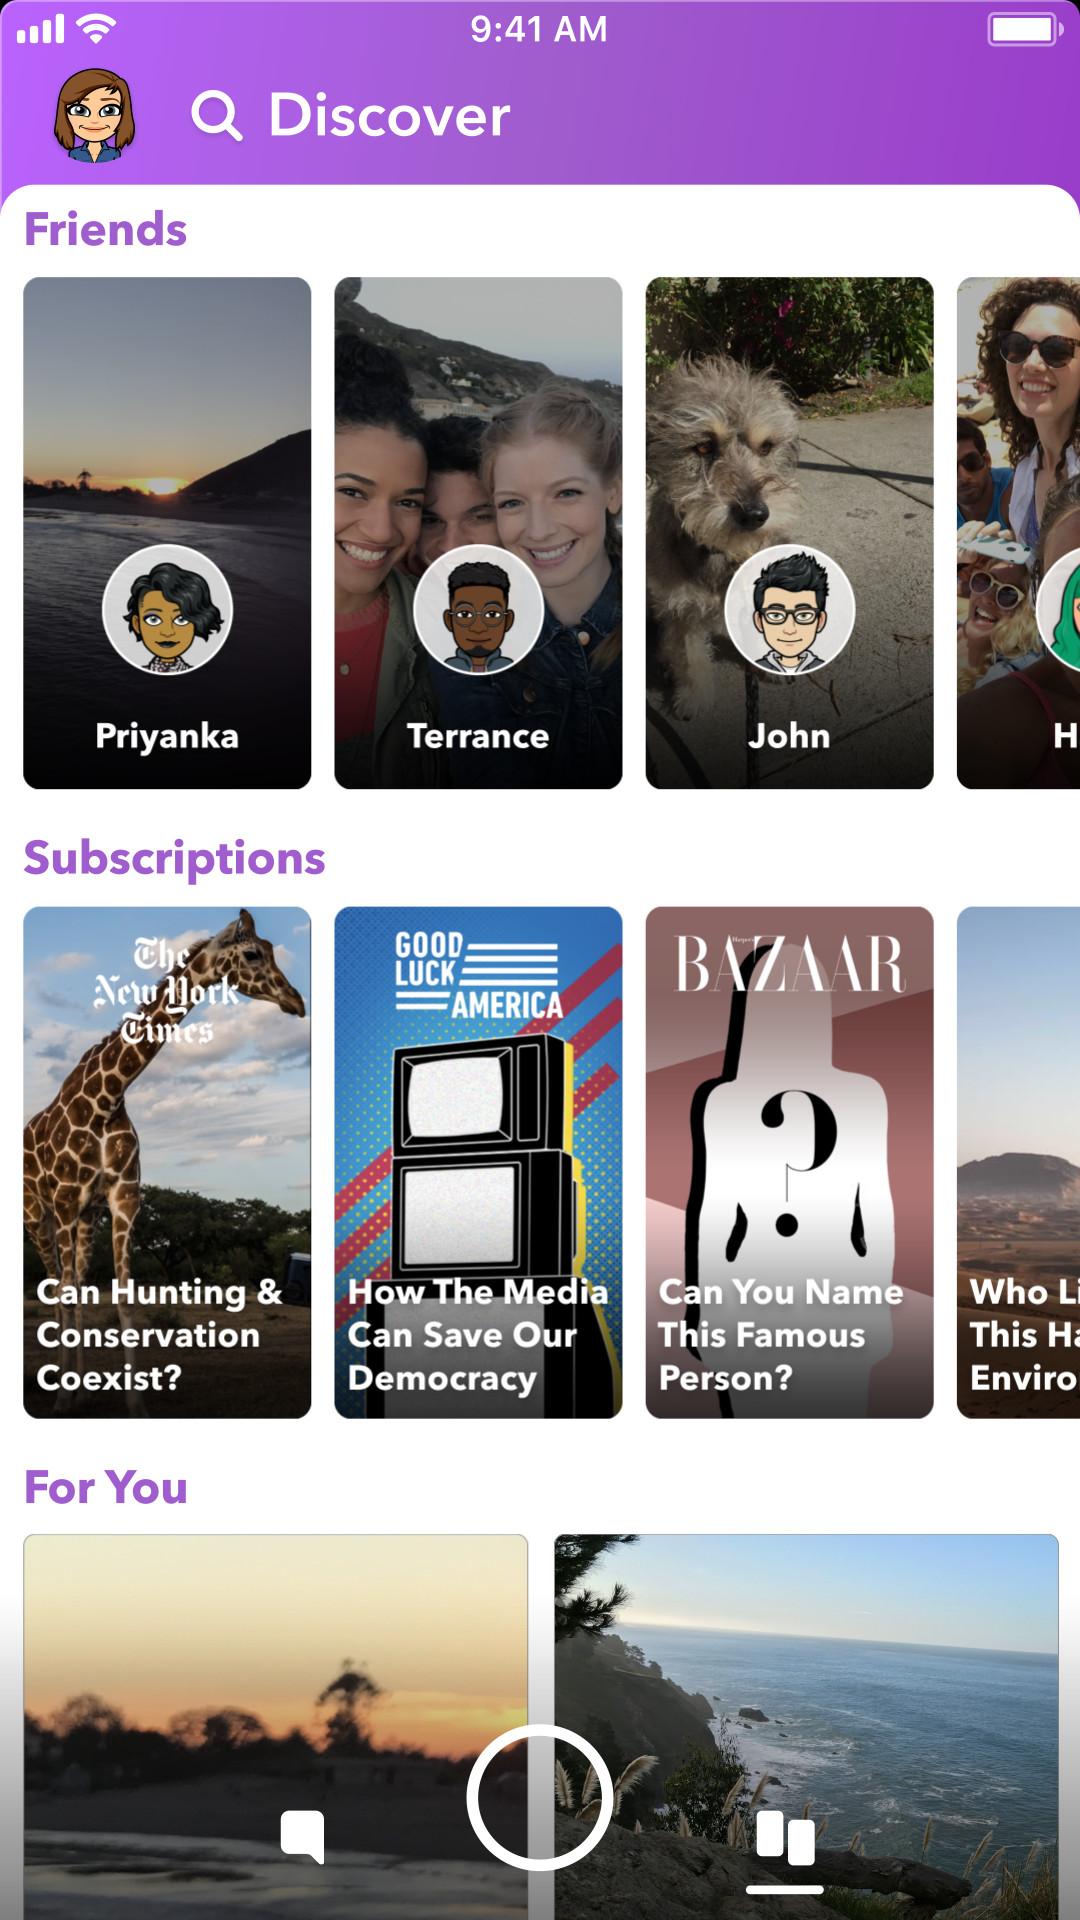 Ephemeral media as seen on snapchat stories